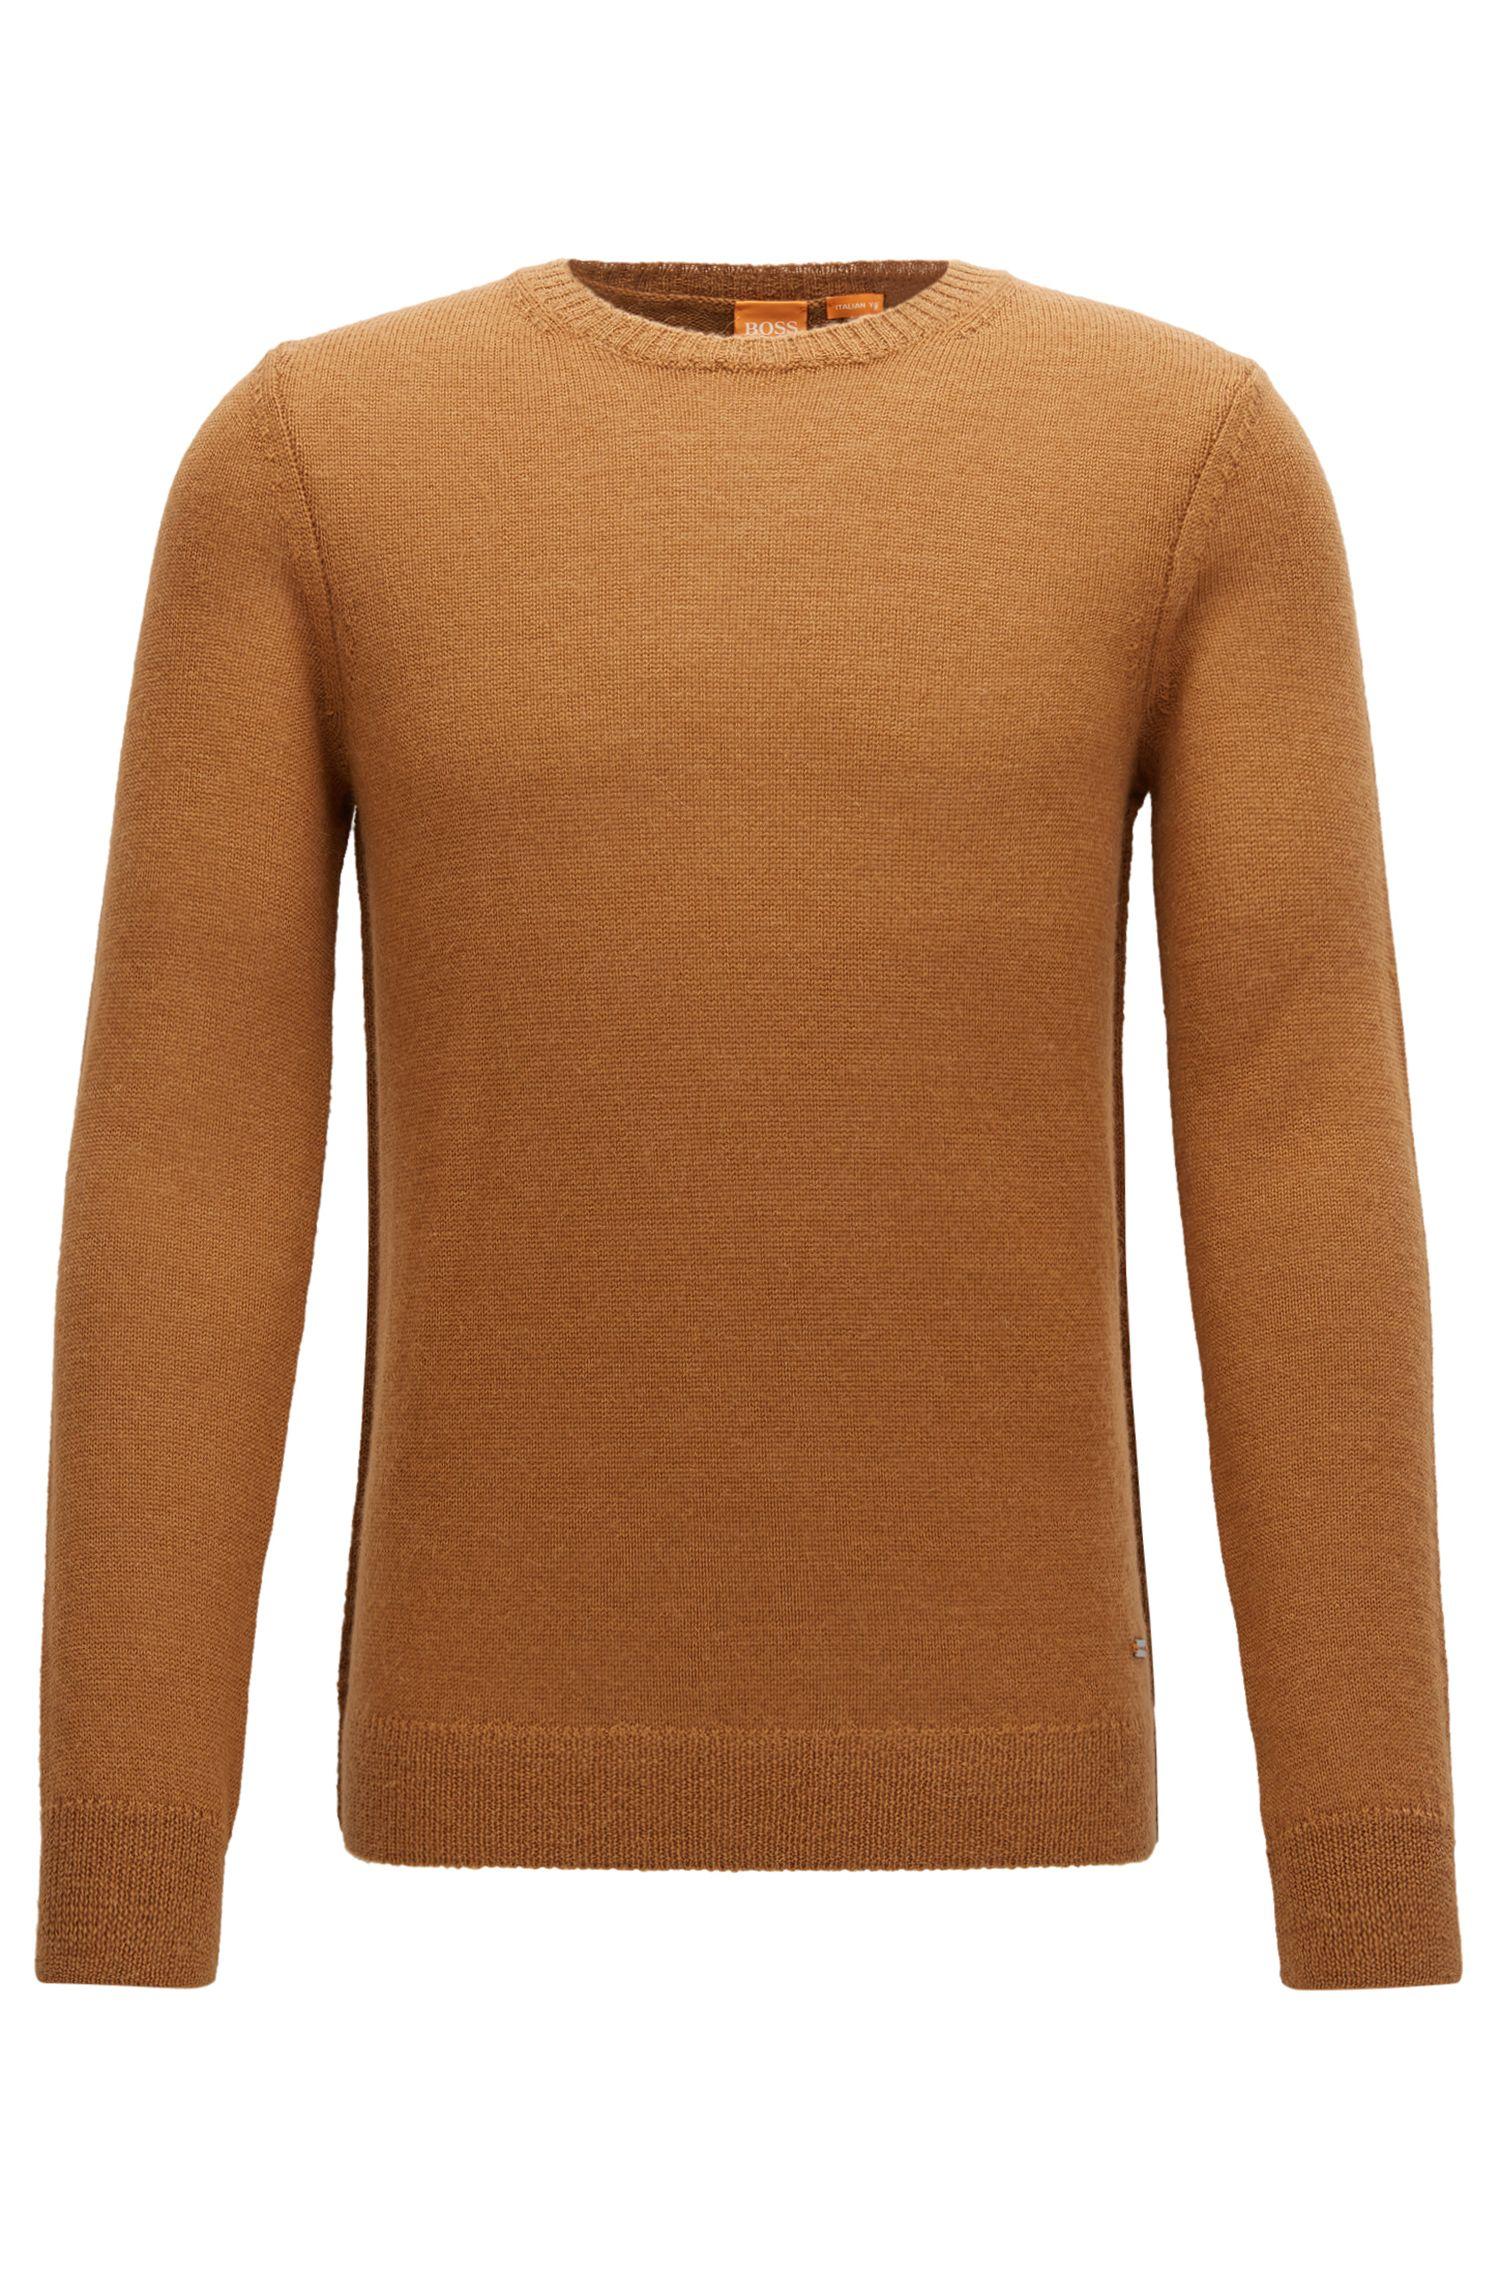 'Kalpak' | Italian Alpaca Wool Sweater